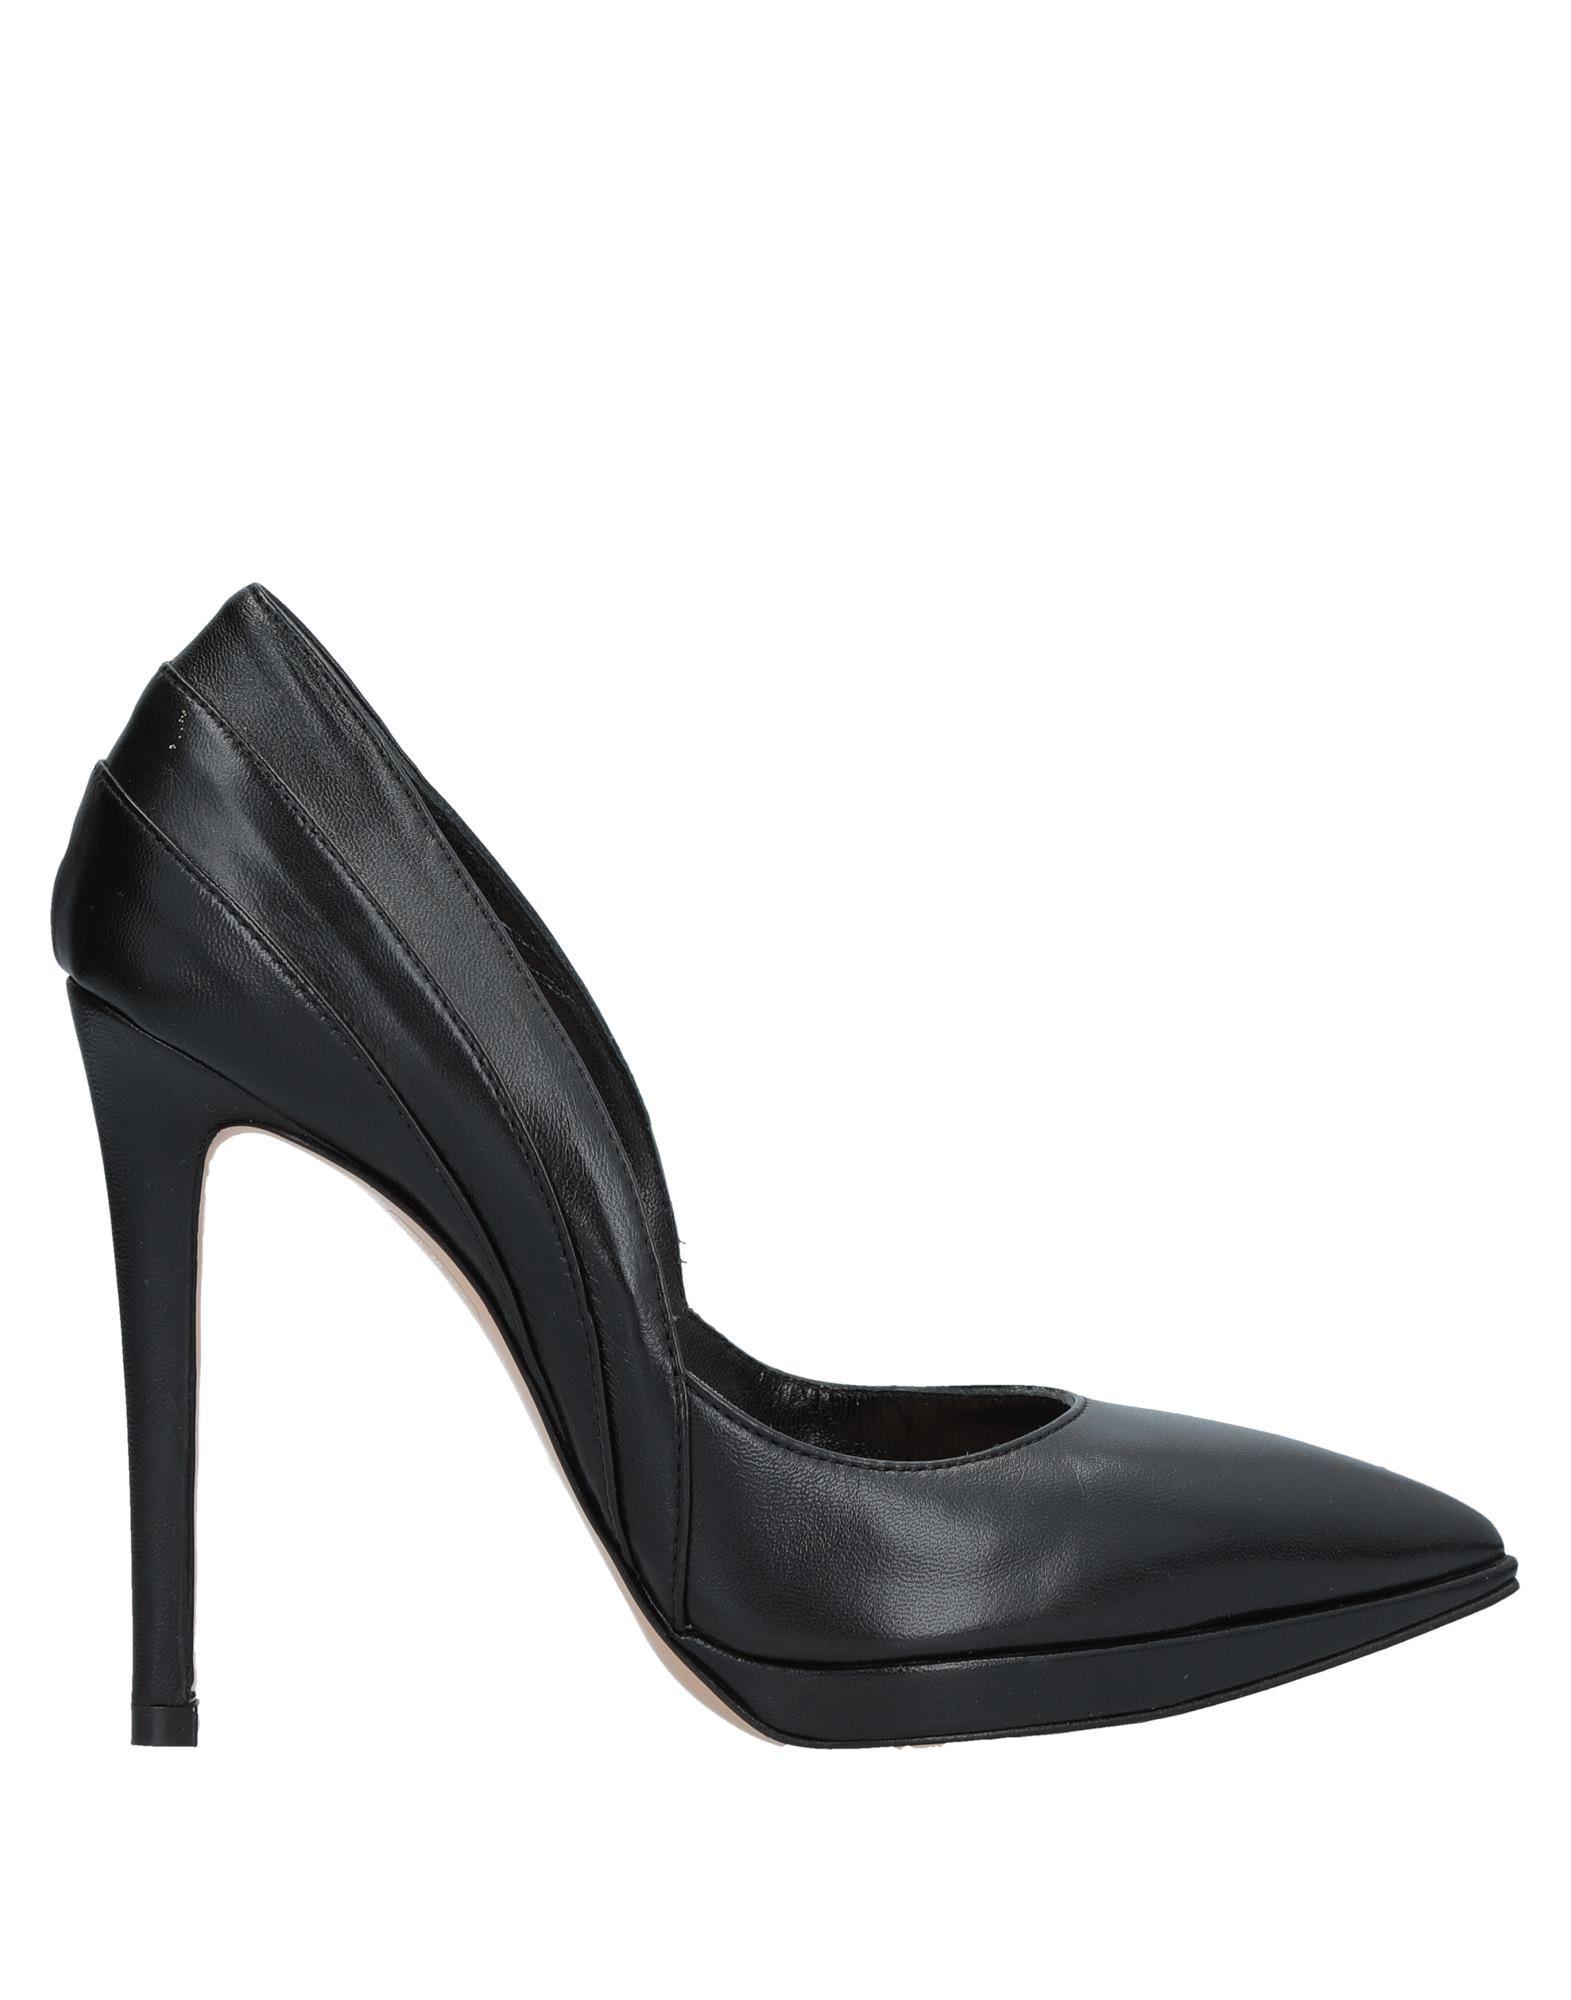 Stilvolle billige Schuhe Damen Icône Pumps Damen Schuhe  11538932KO 3a471e